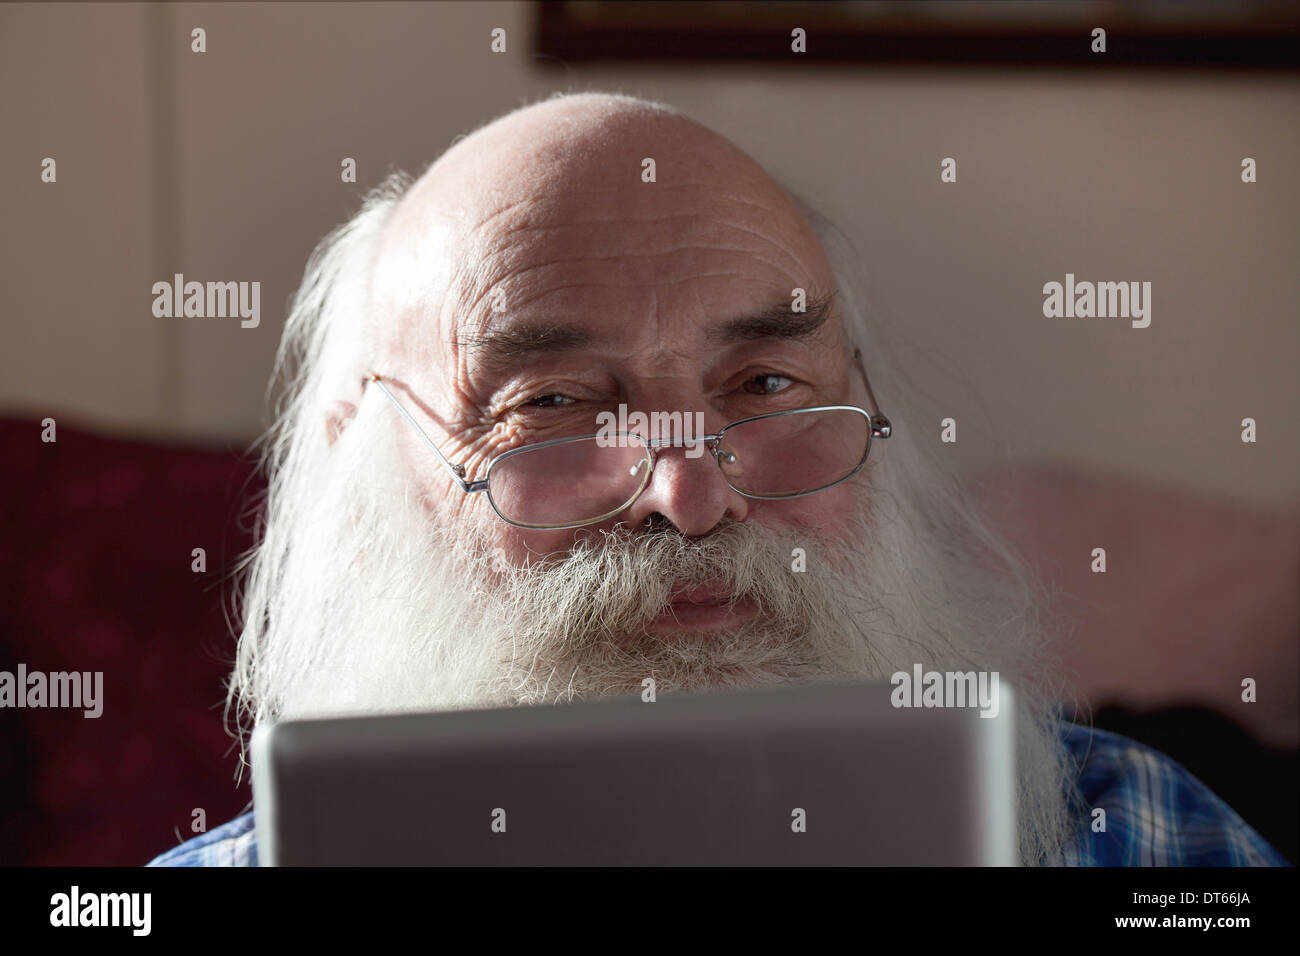 Senior man using digital tablet Photo Stock